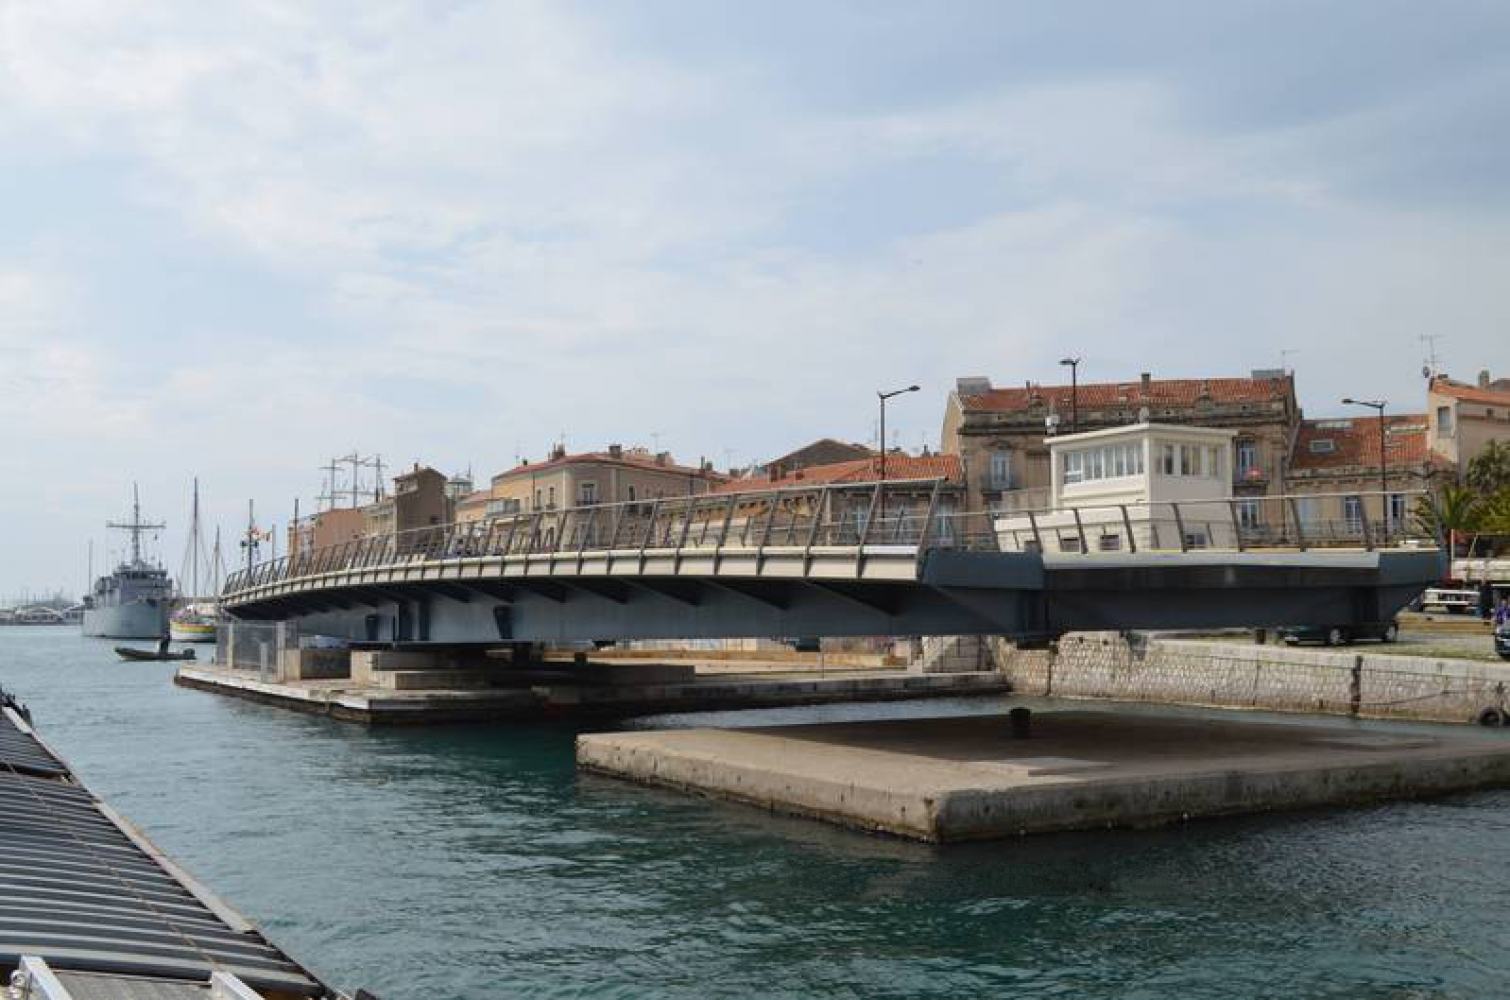 04-sete-img-007 Pascale SEURIN Architecte - Pascale SEURIN Architecte